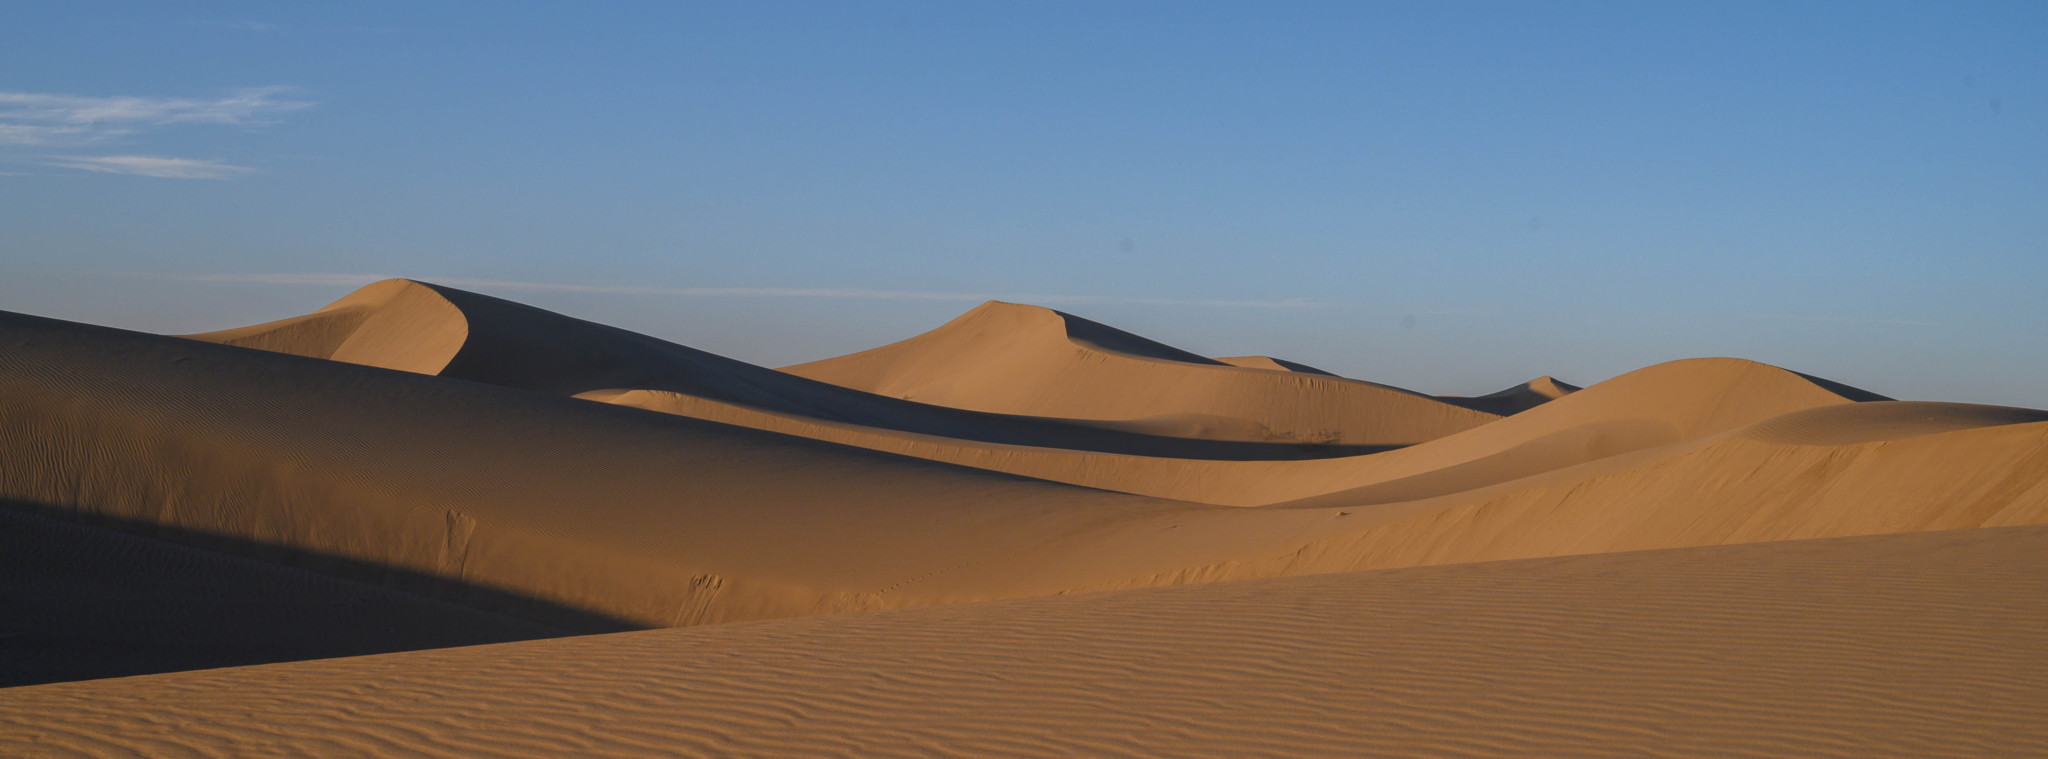 Sanddünen Iran